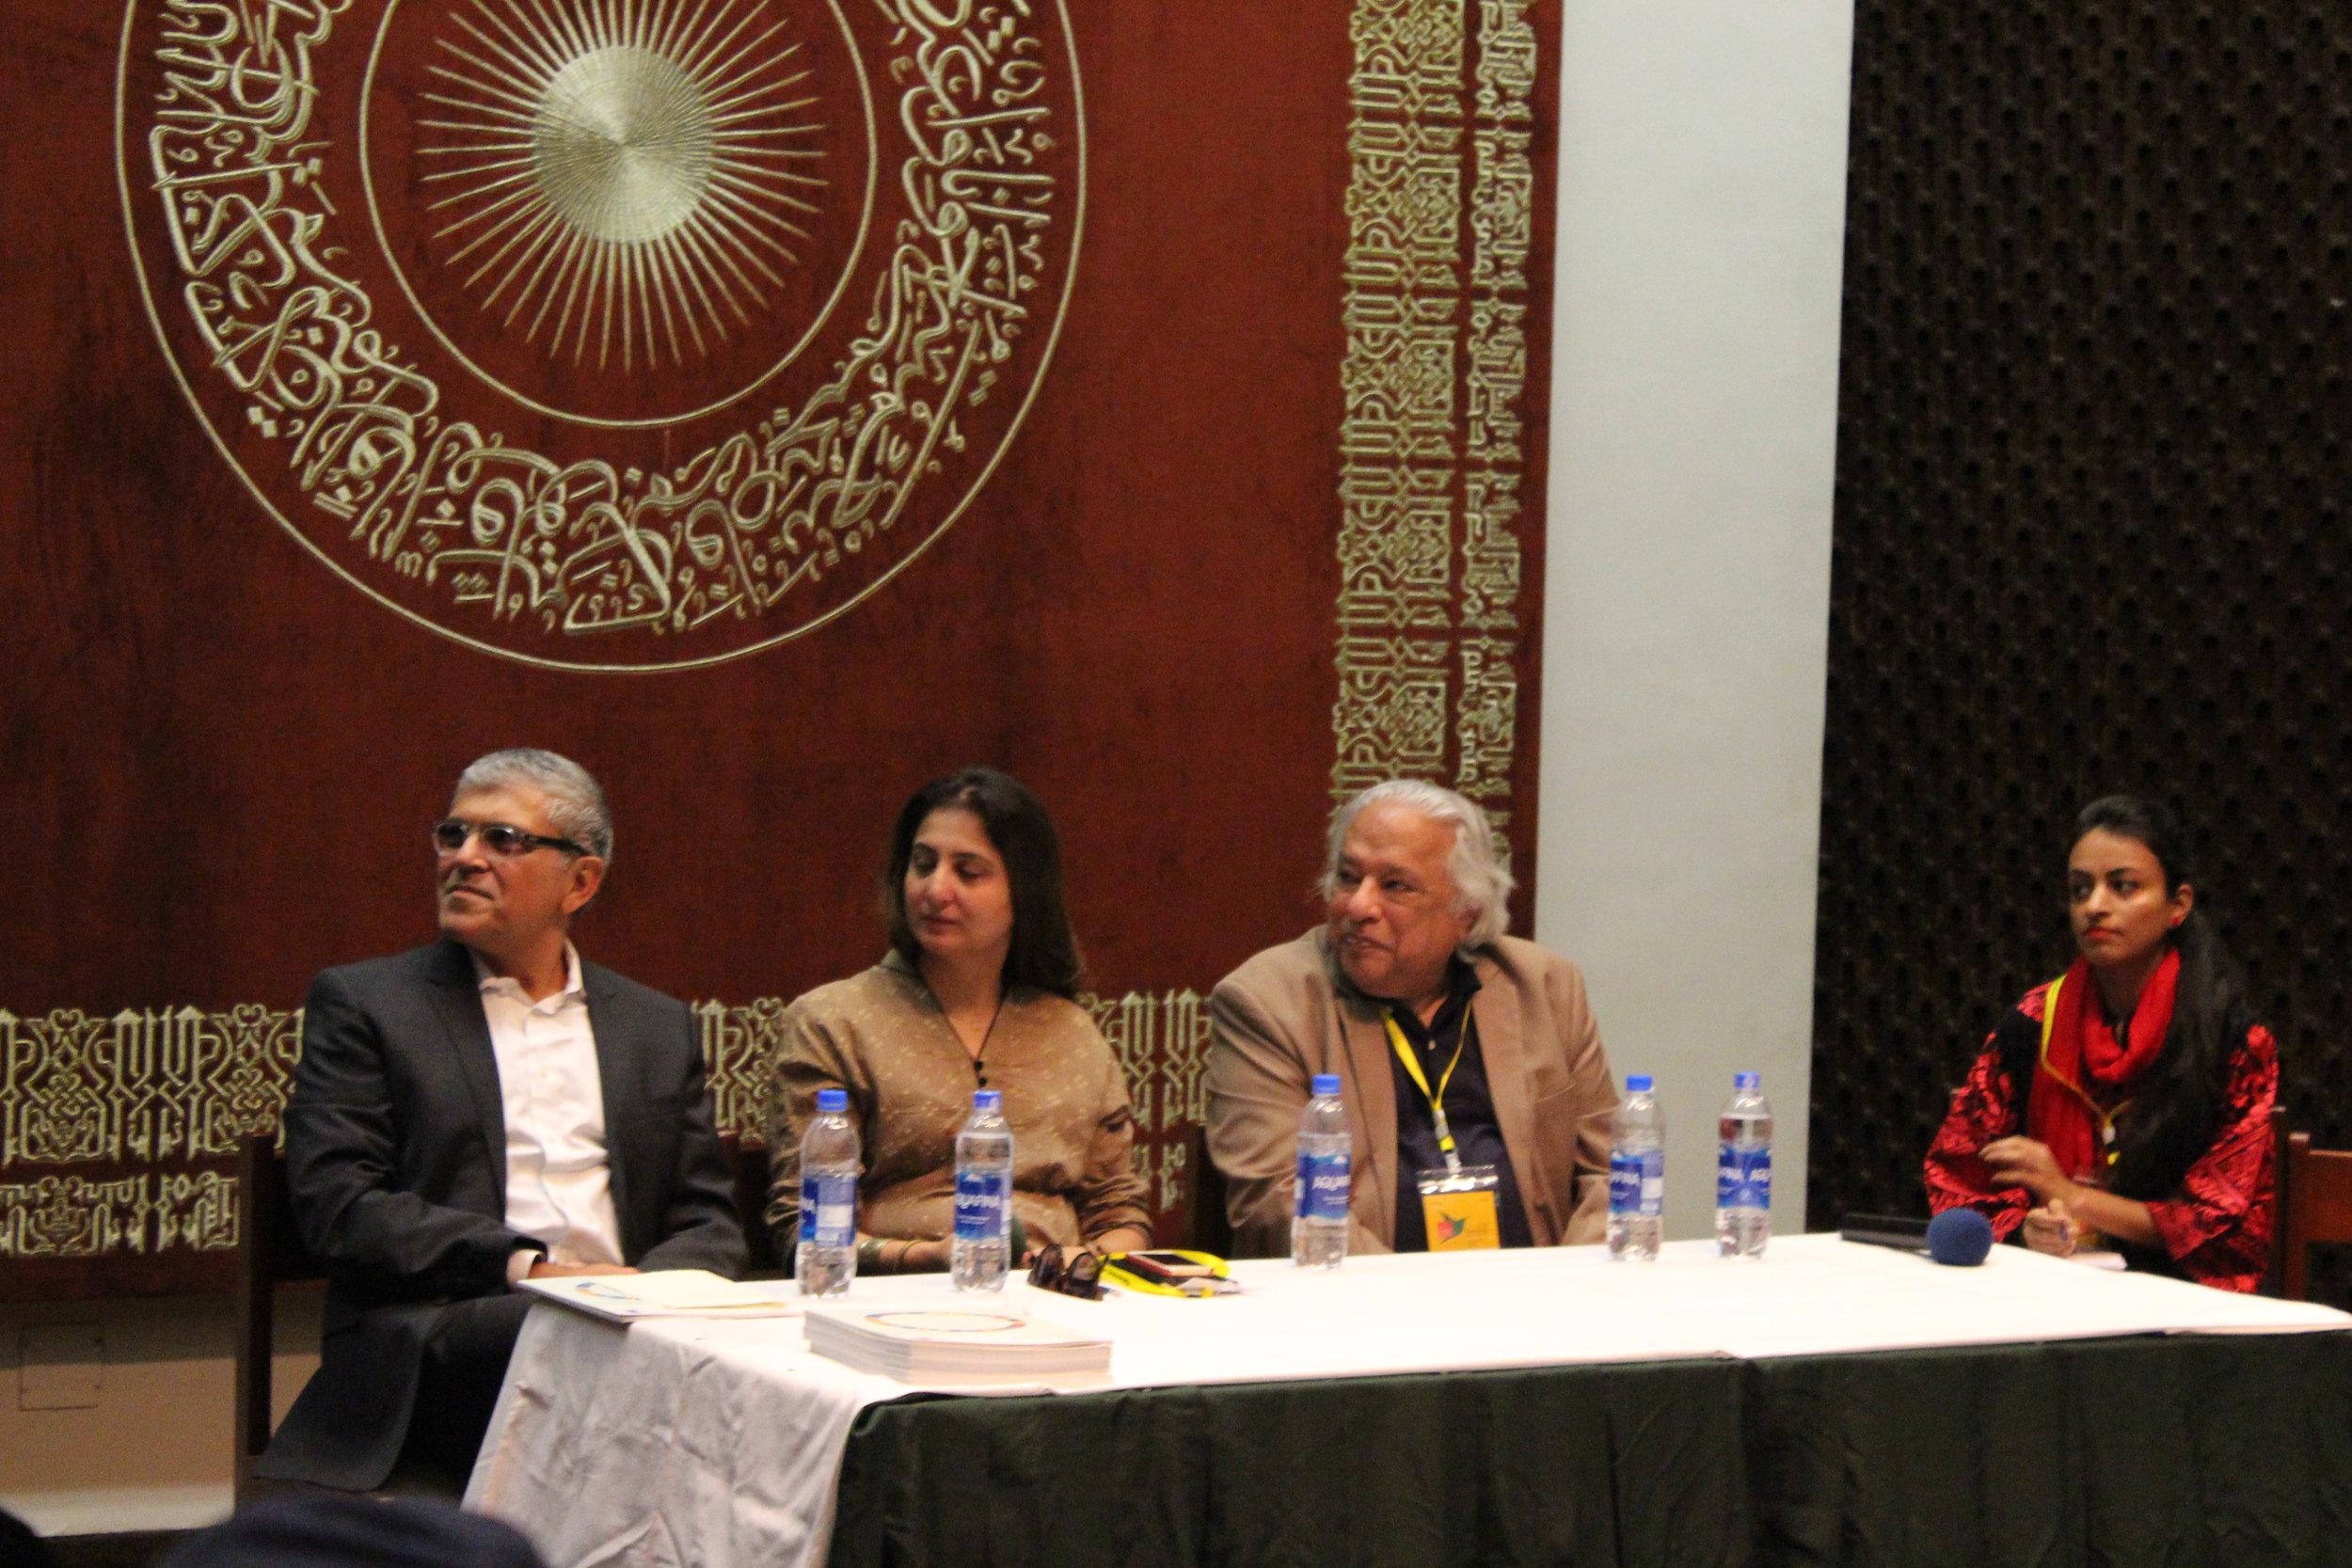 Panel discussion on Student Centered Design & Academic Spaces including Panelist Safdar Abidi, Marvi Mazhar and Arif Hasan.